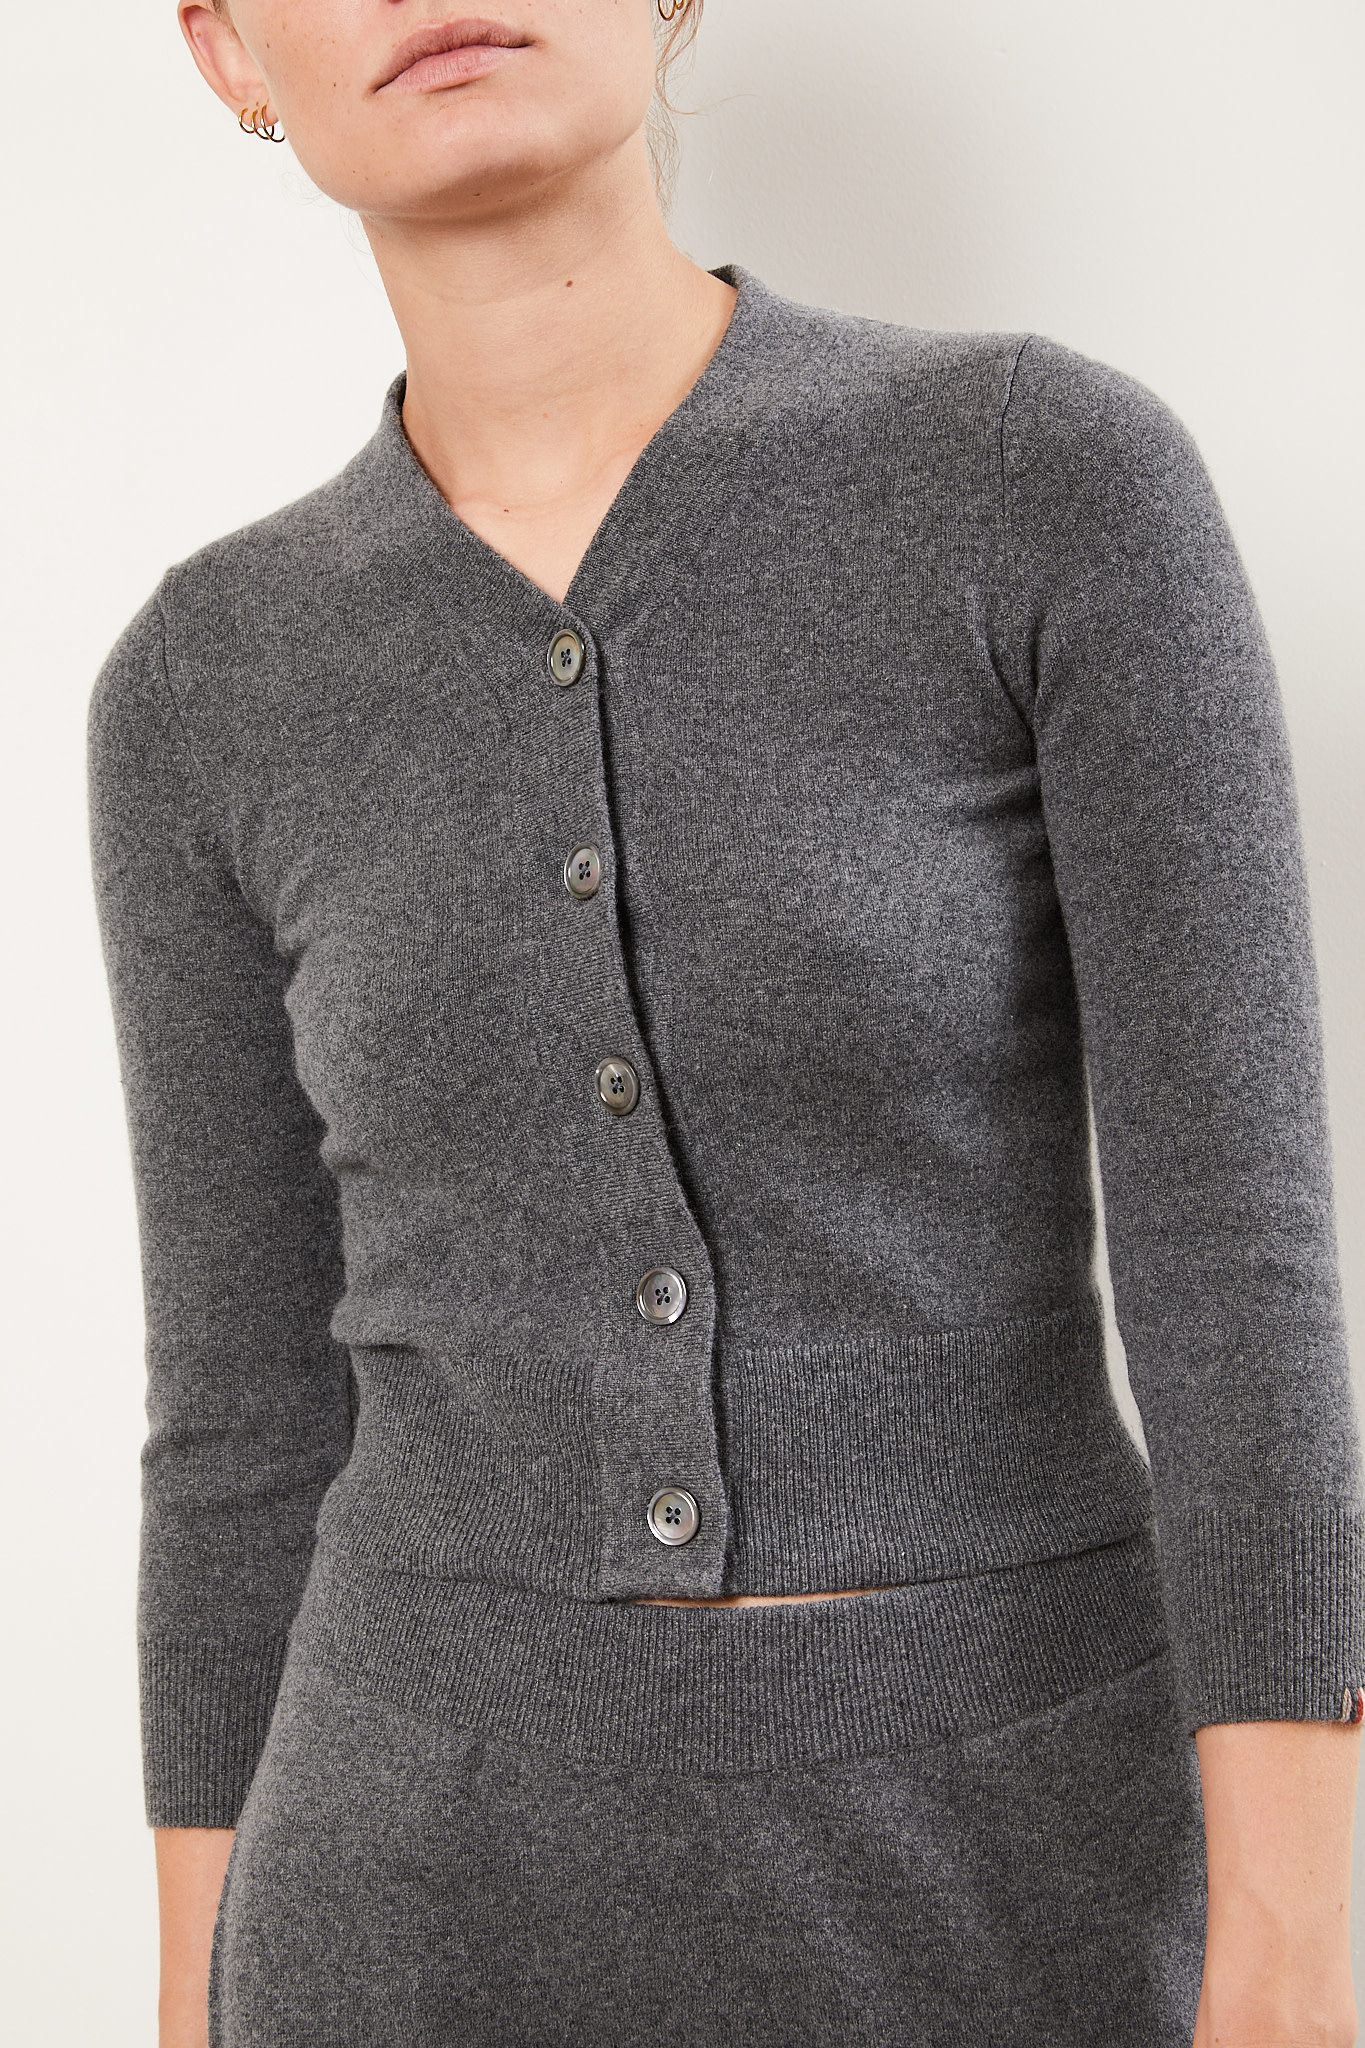 extreme cashmere - Angel cashmere cardigan